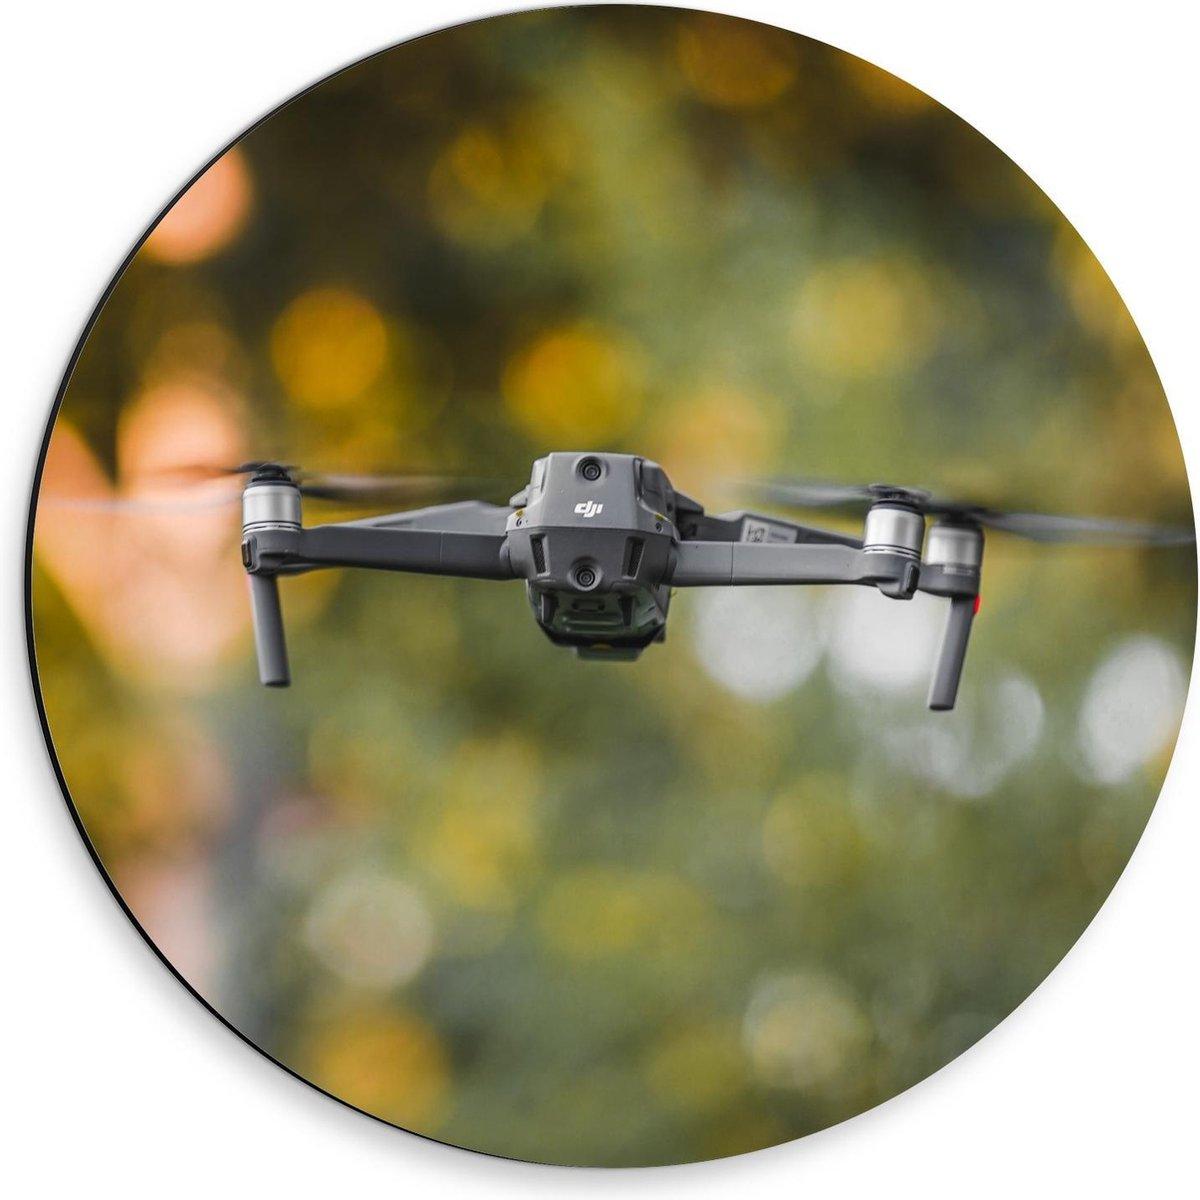 Dibond Wandcirkel - Drone op Groene Achtergrond - 30x30cm Foto op Aluminium Wandcirkel (met ophangsysteem)